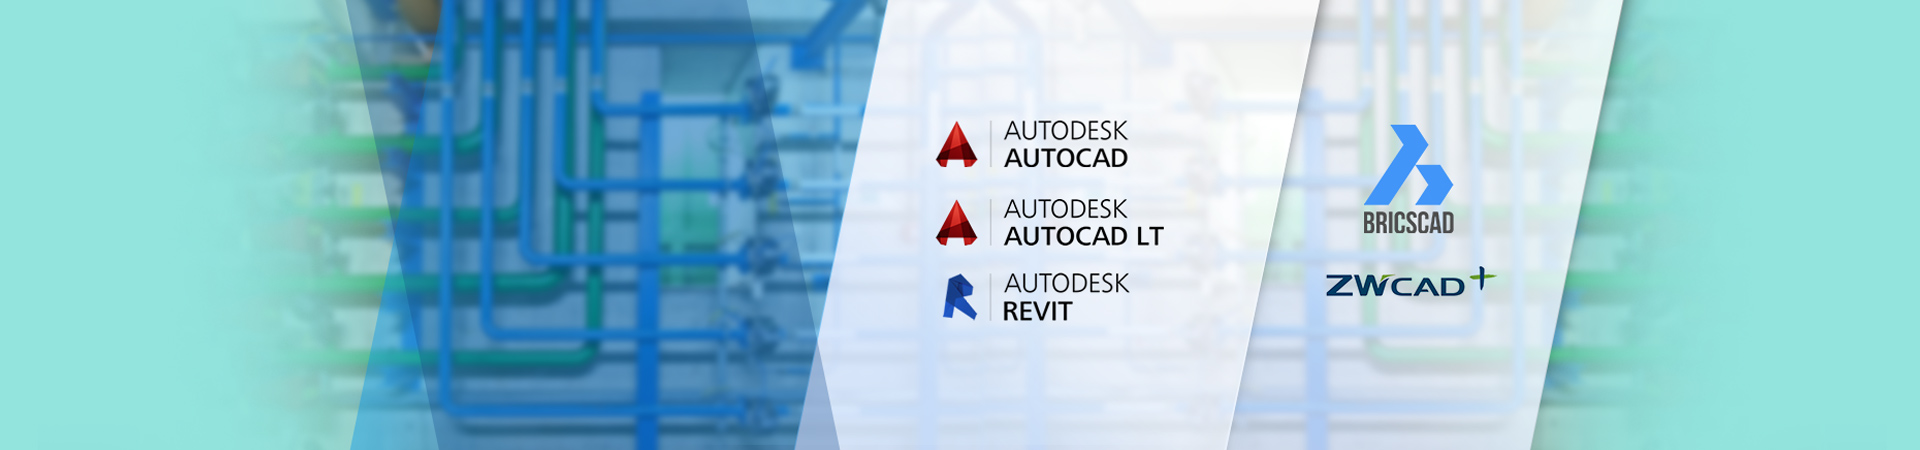 autofluid_logiciel-genie-climatique_traceocad_accueil_slider-3